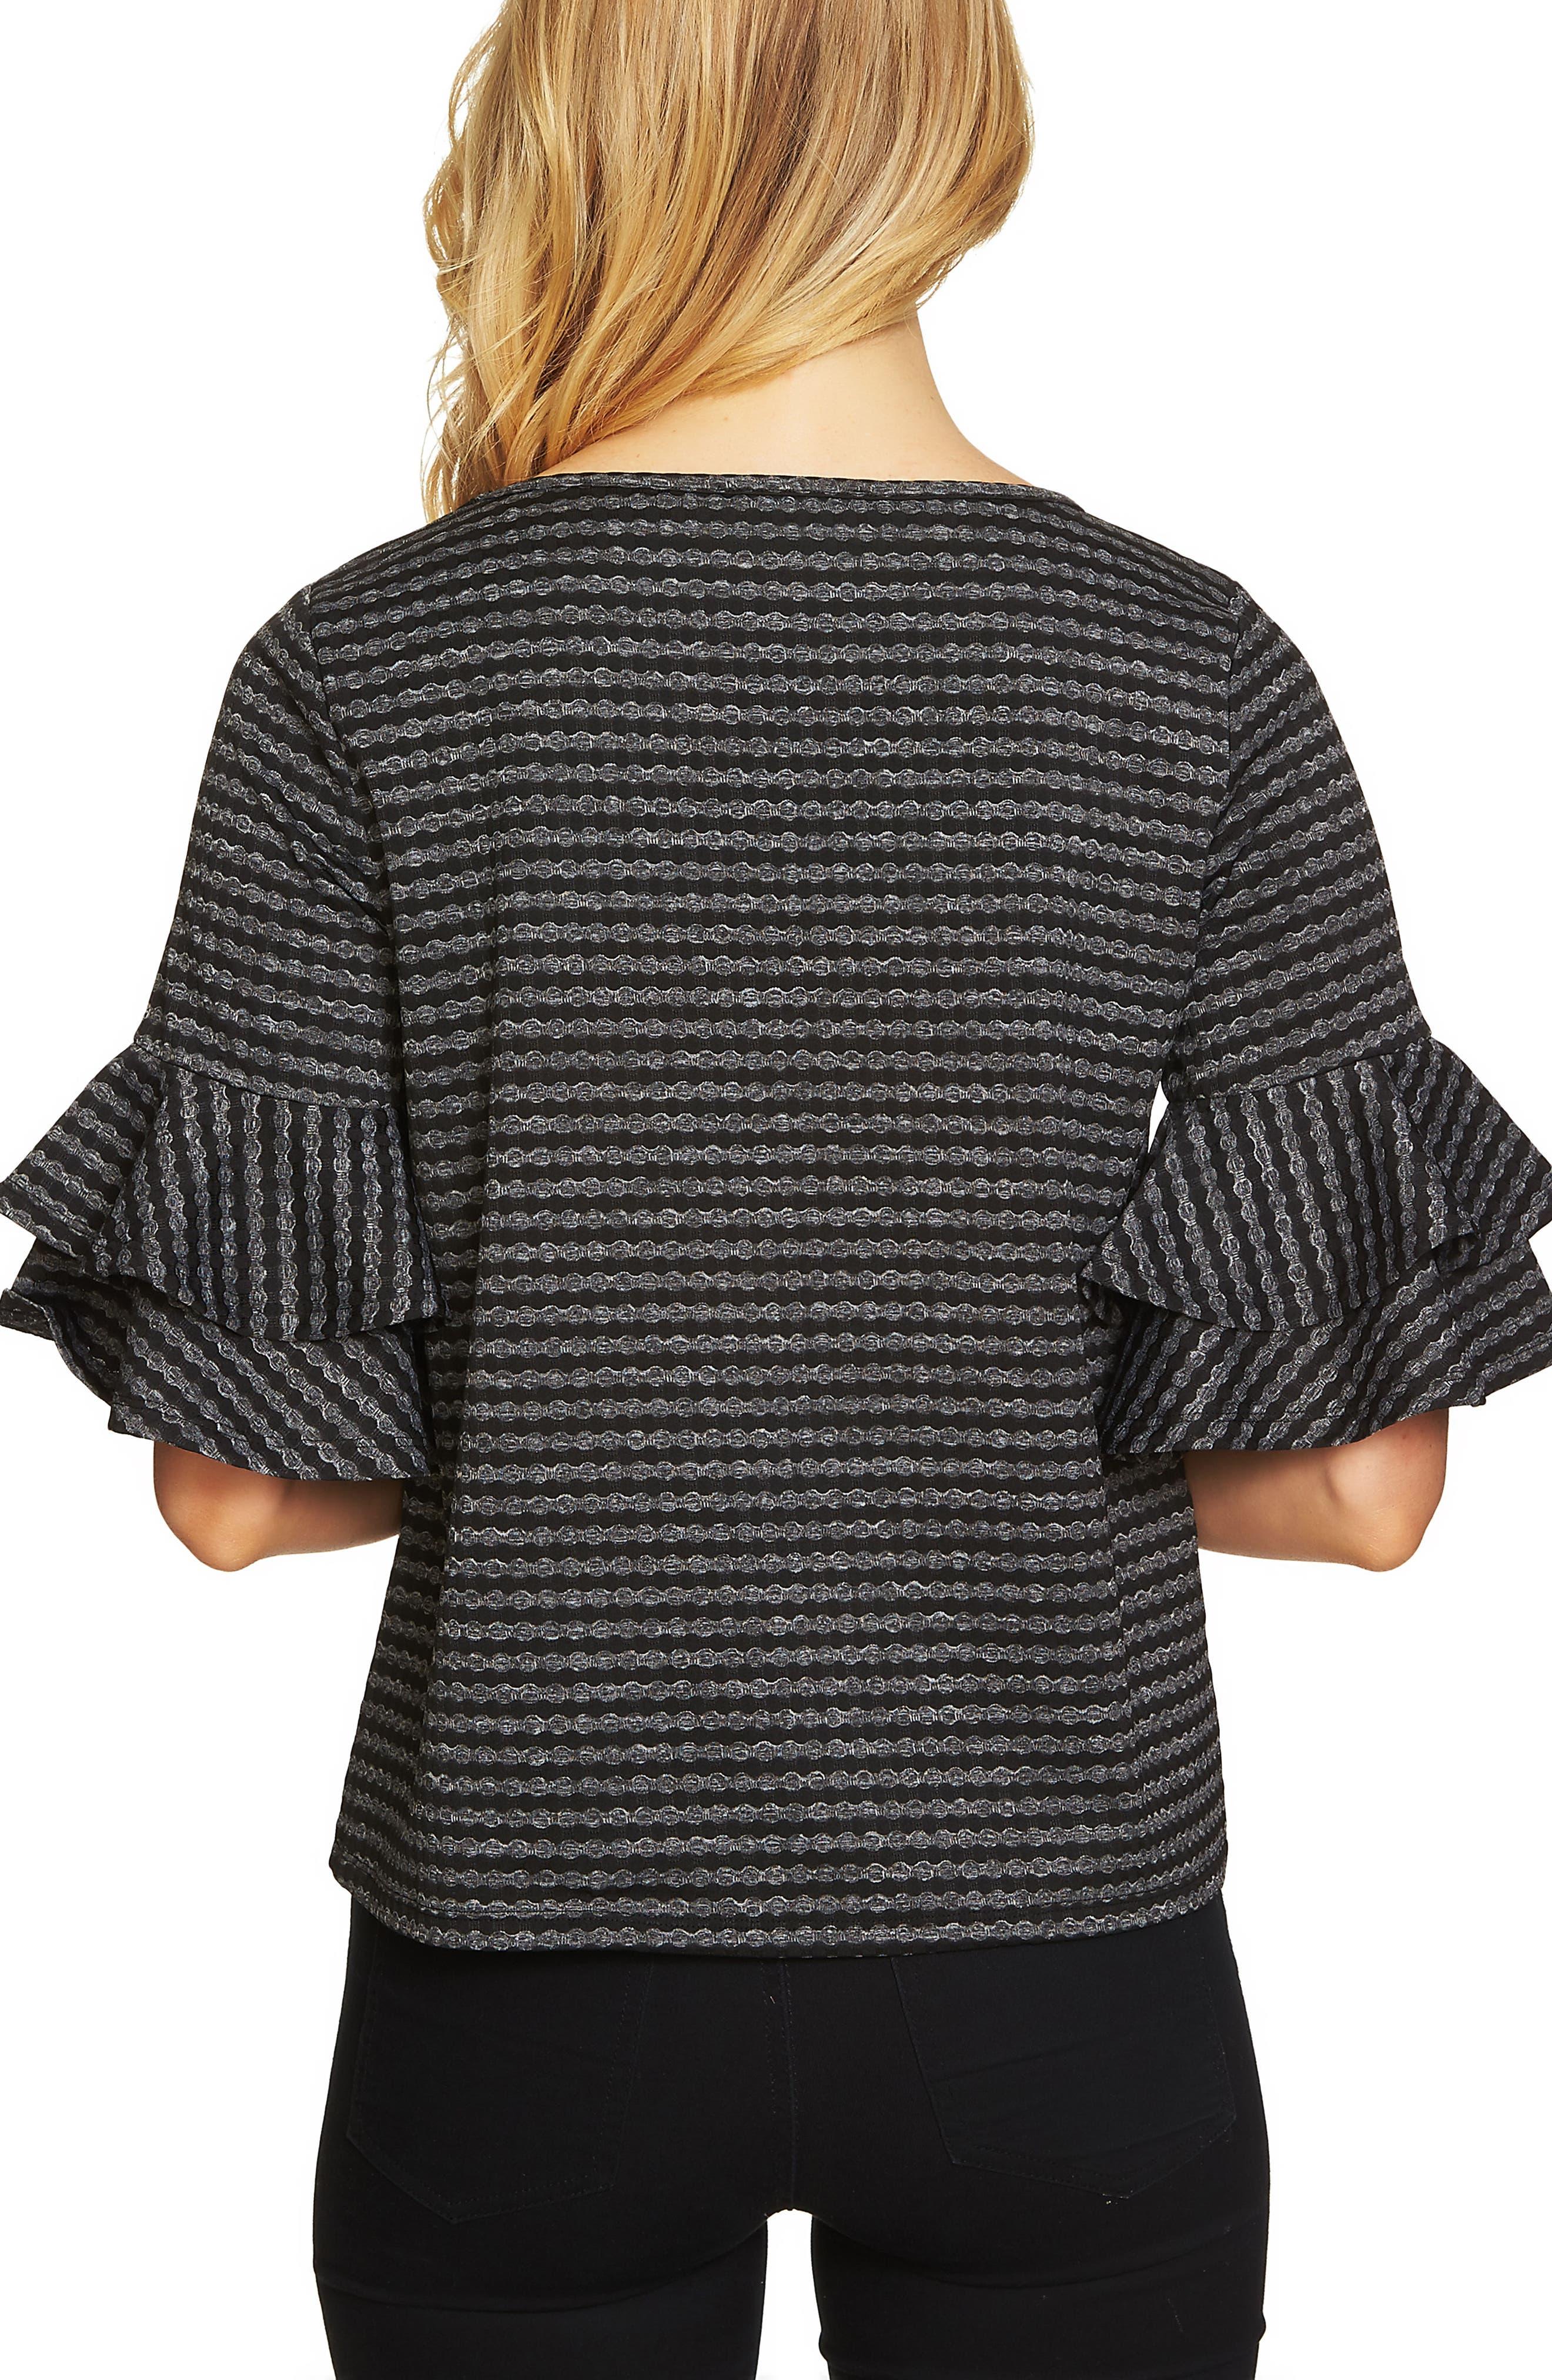 Ruffle Sleeve Knit Top,                             Alternate thumbnail 2, color,                             Rich Black